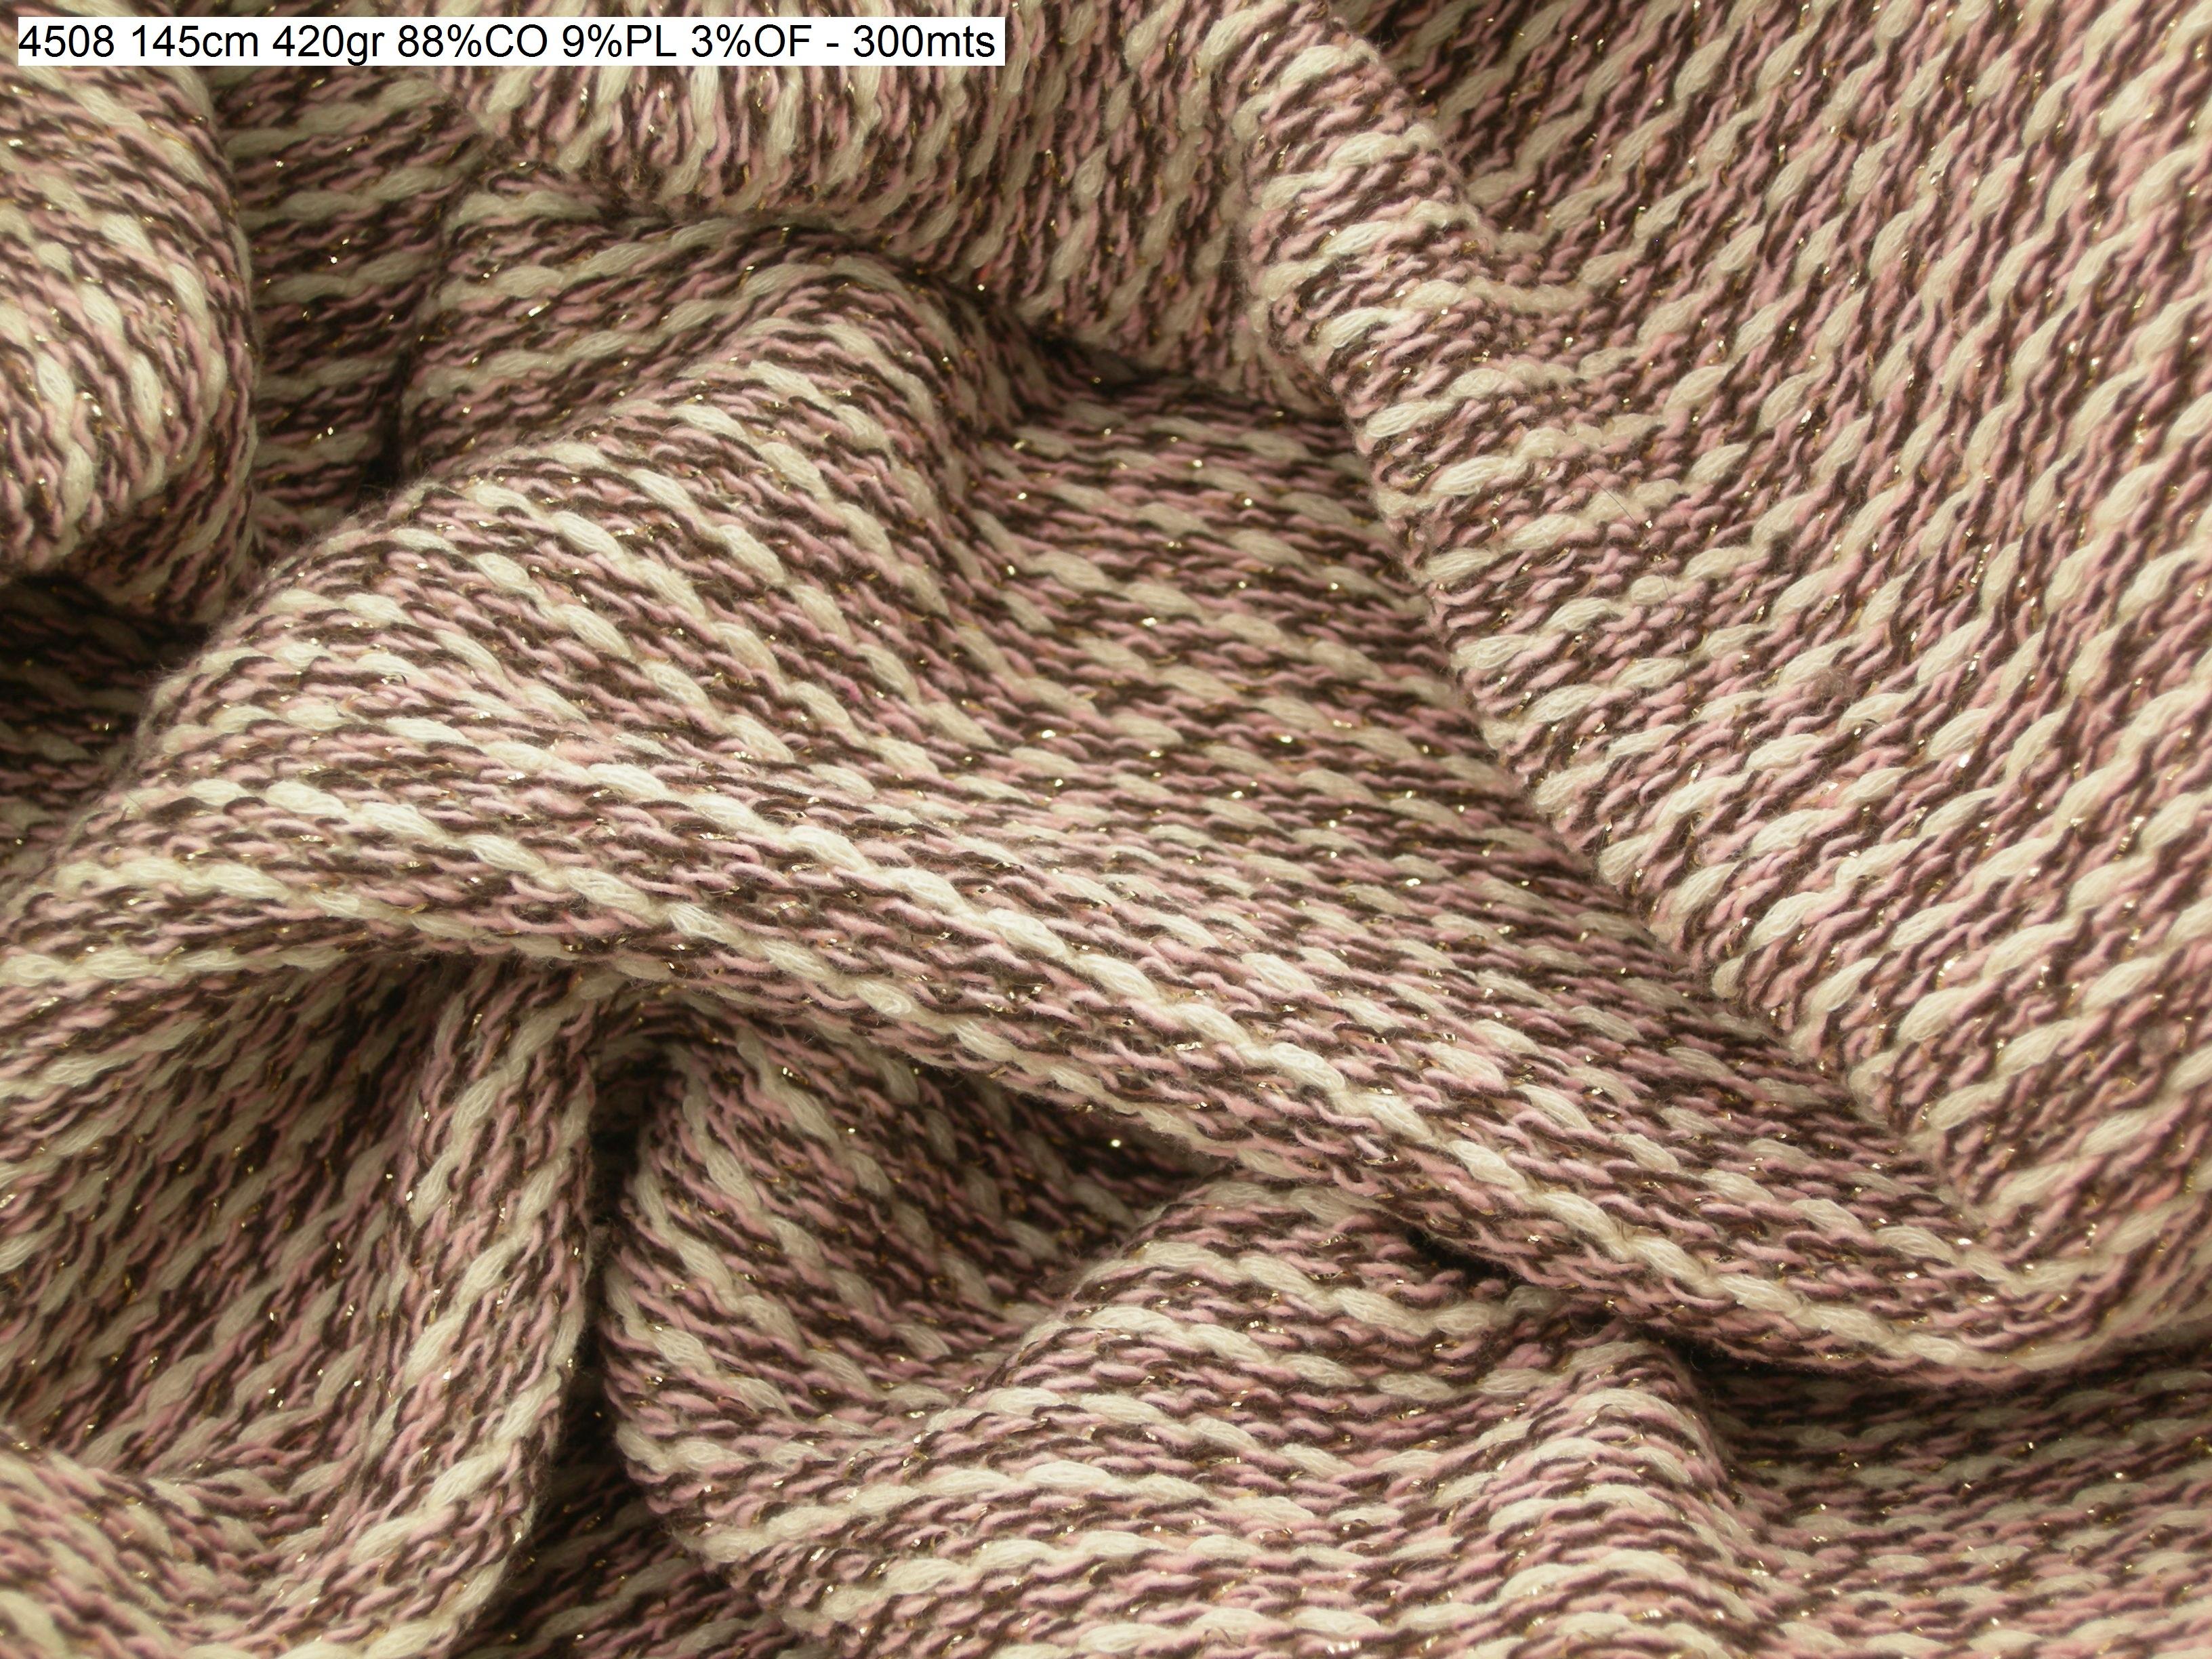 4508 Lurex chanel knit jacket coat fashion fabric